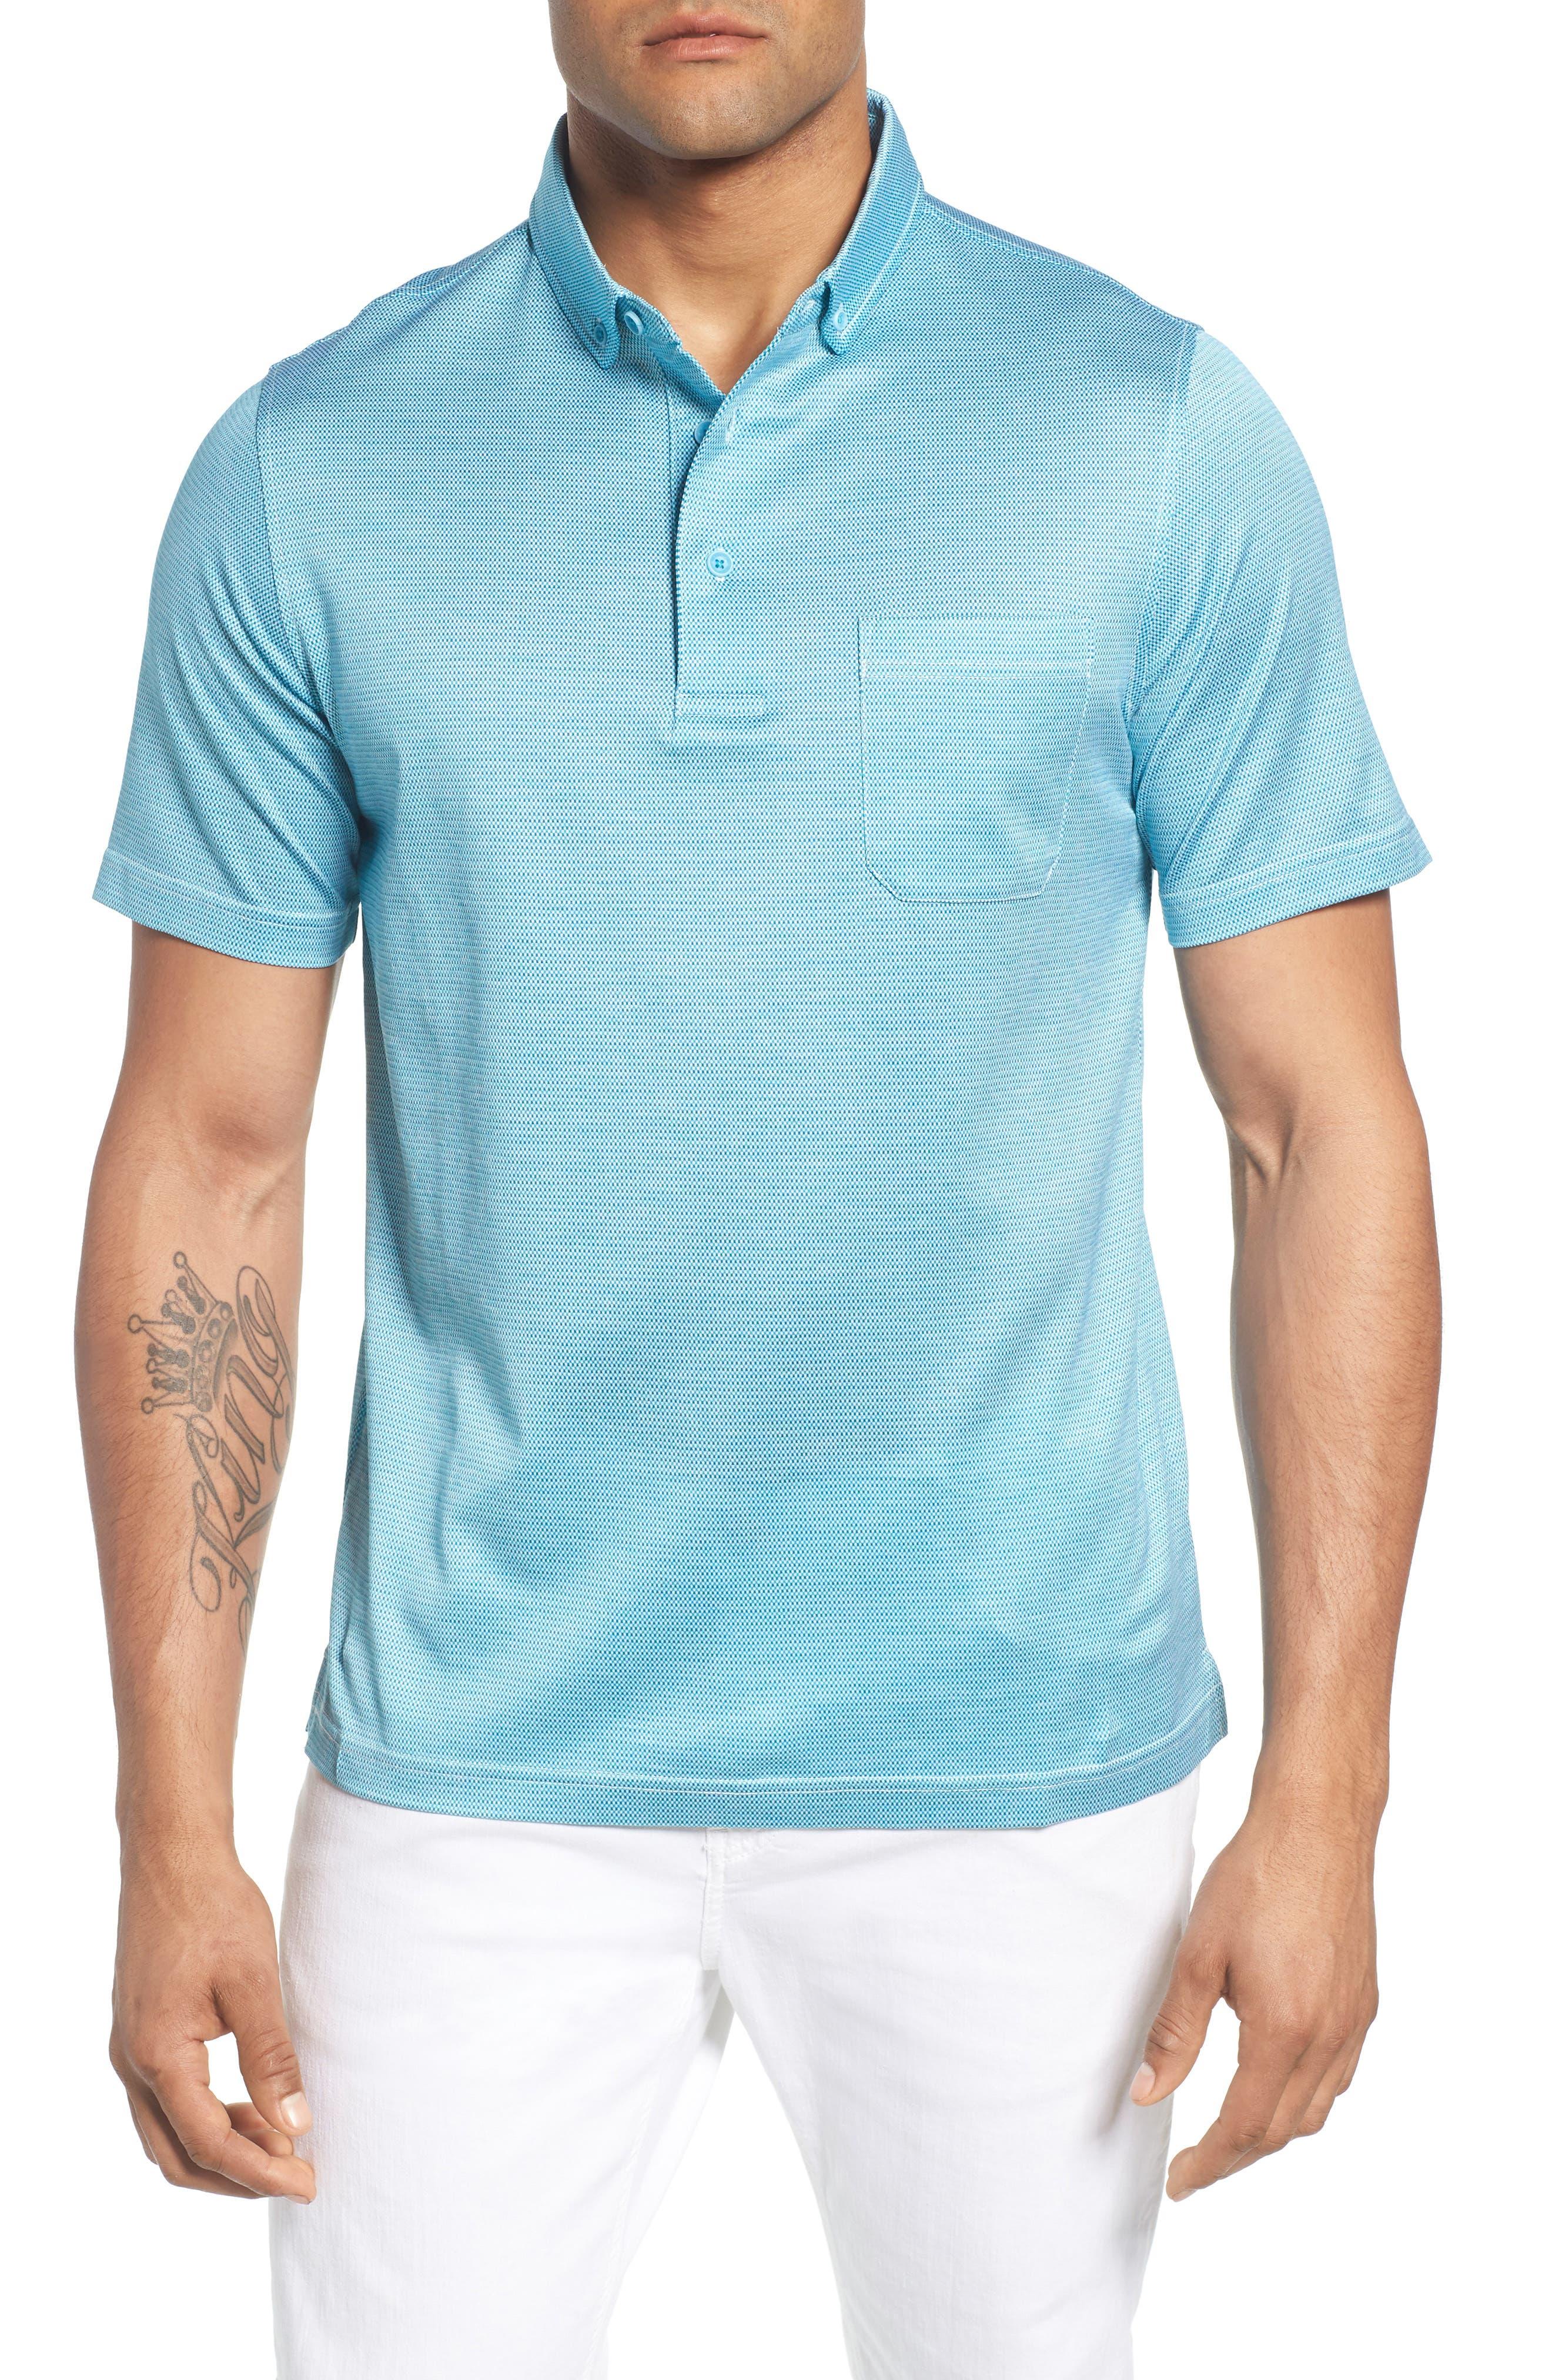 BUGATCHI Dot Mercerized Cotton Polo, Main, color, 425